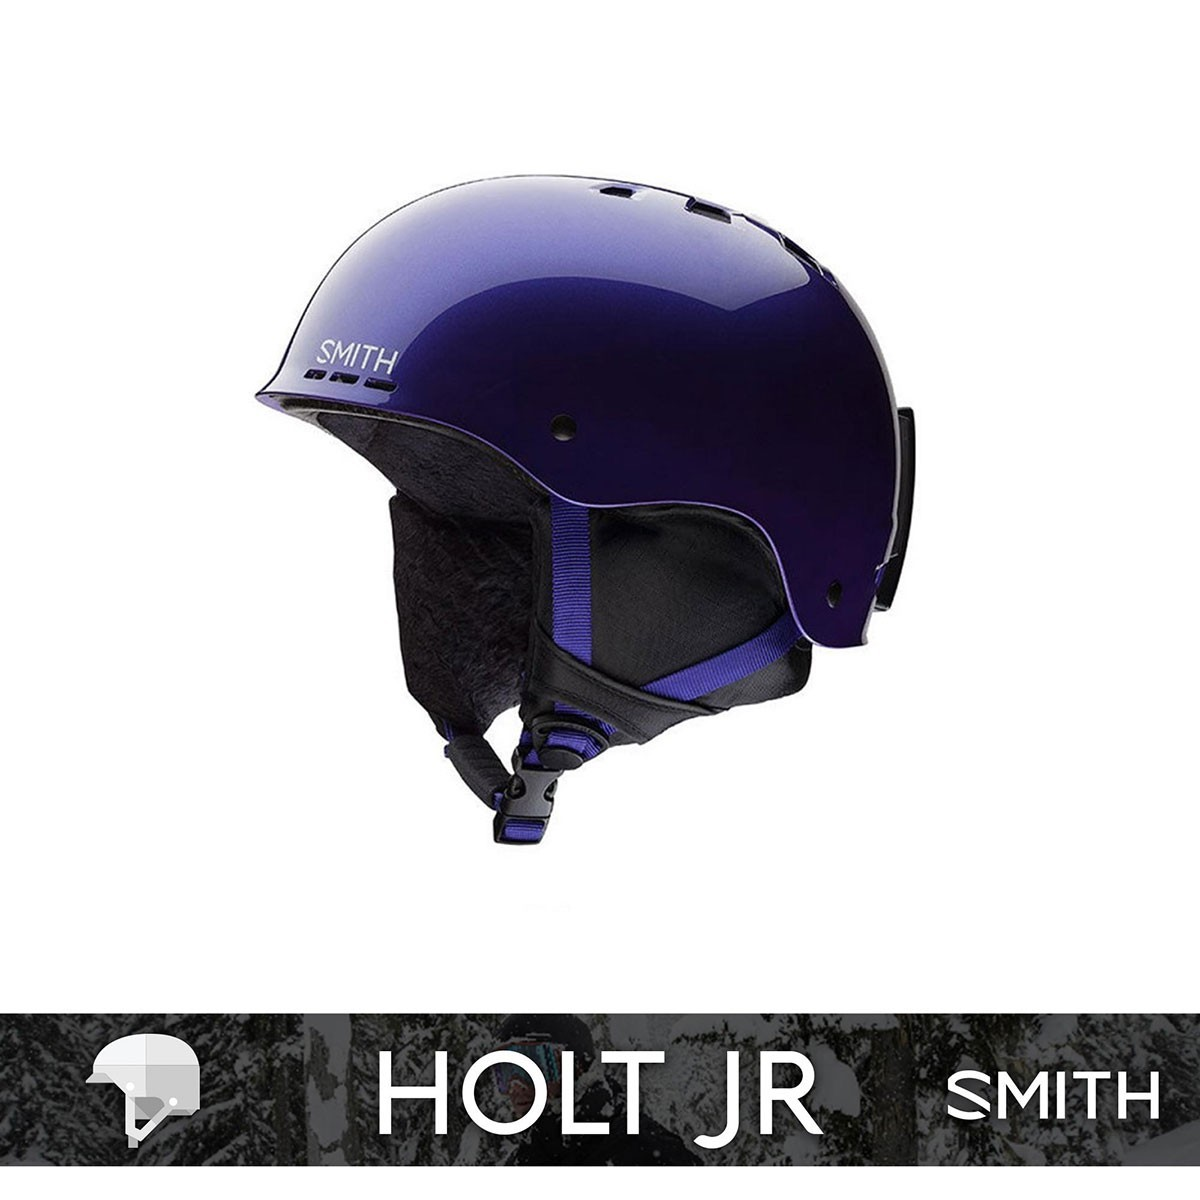 SMITH HOLT JR Ultraviolet - Изображение - AQUAMATRIX